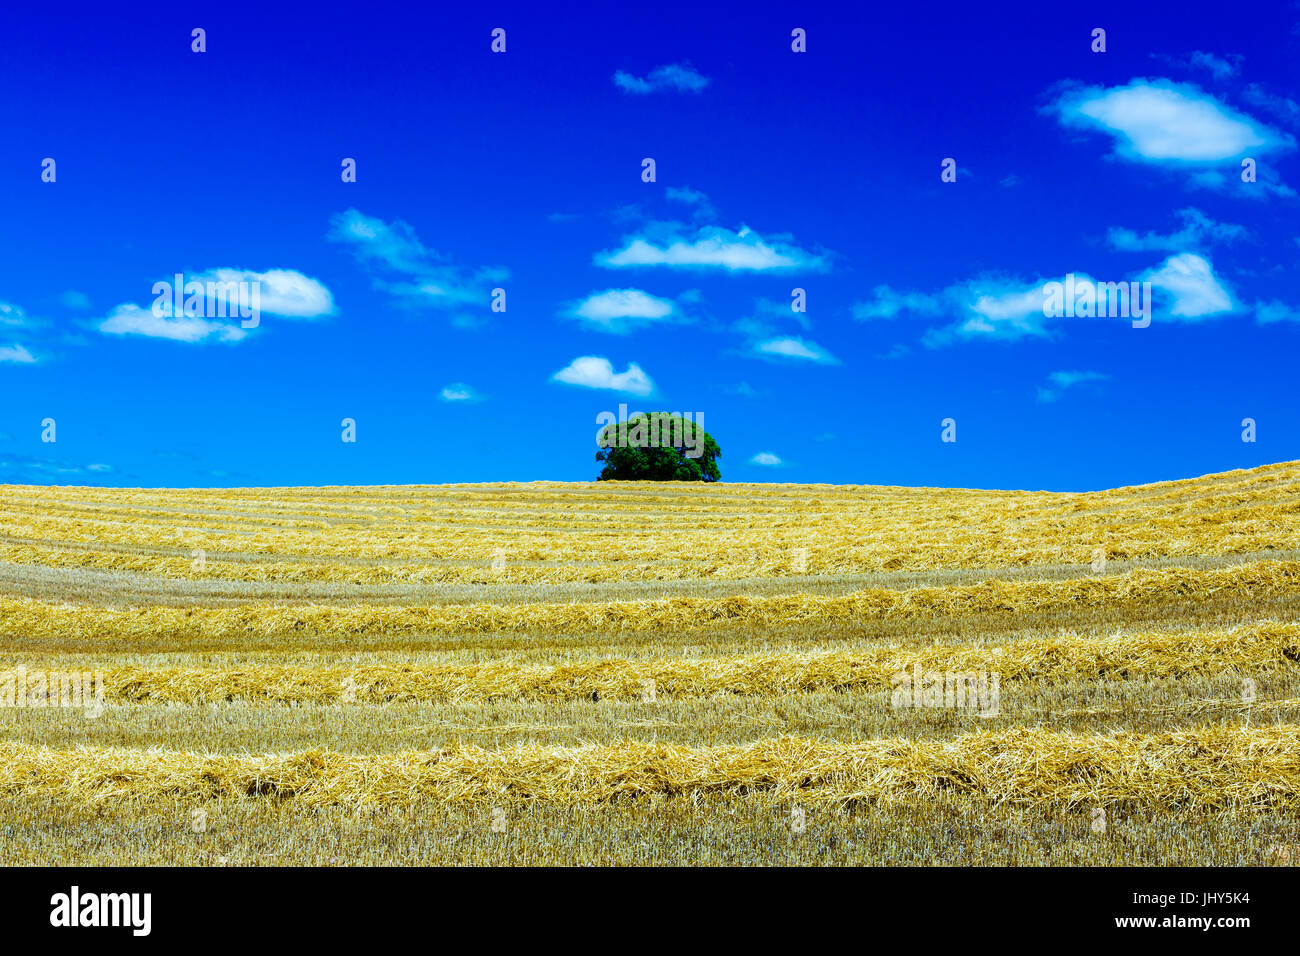 Cereal farm. Stock Photo